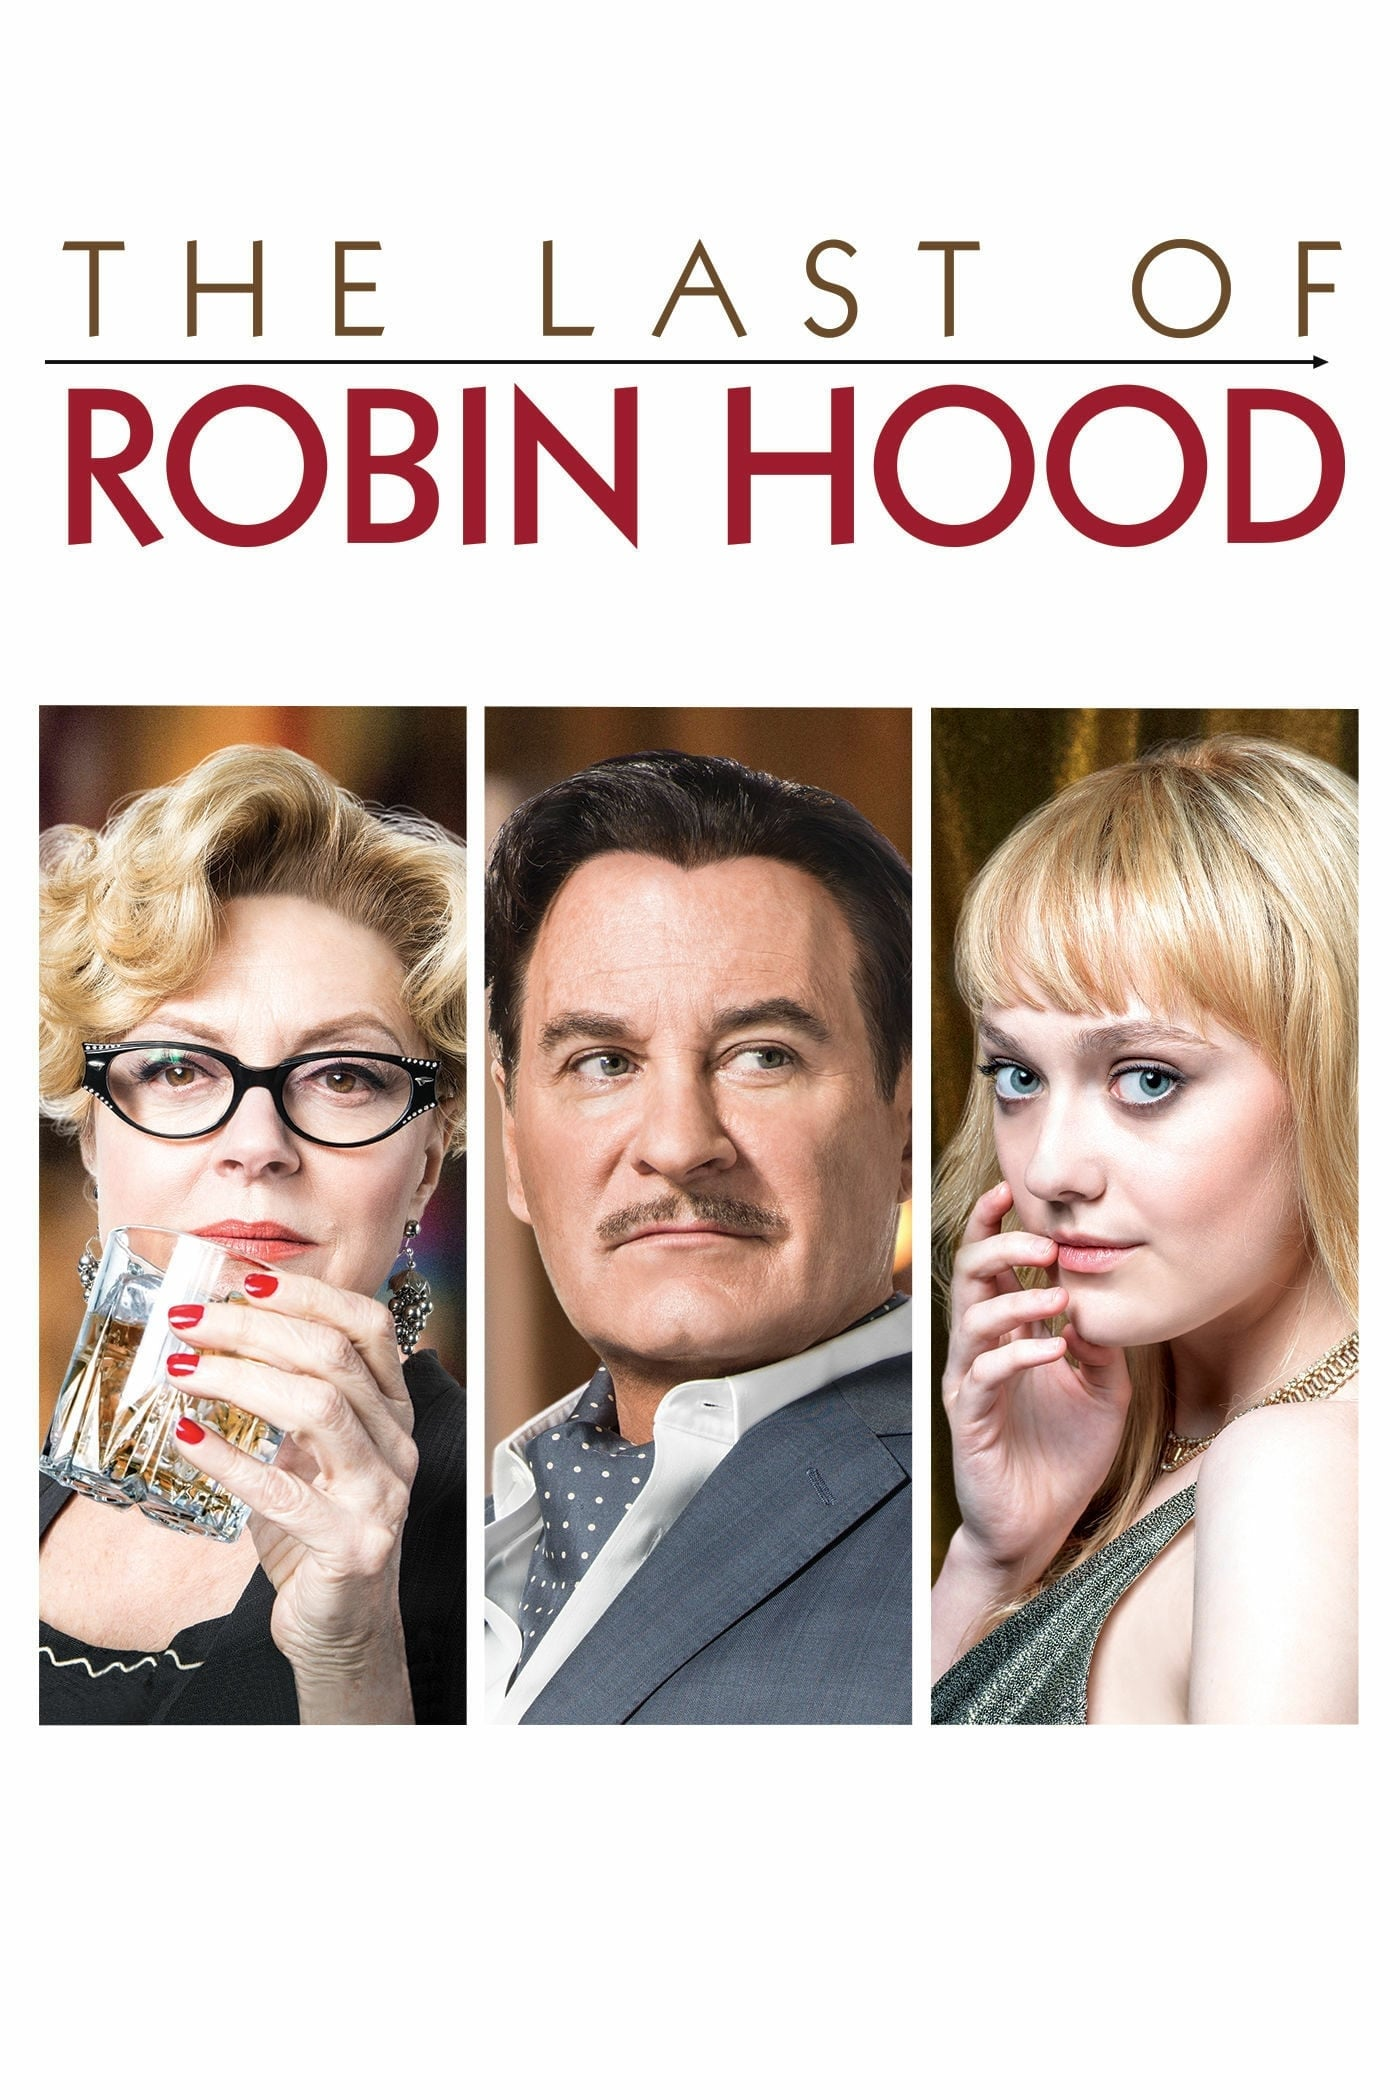 The Last of Robin Hood (2013)